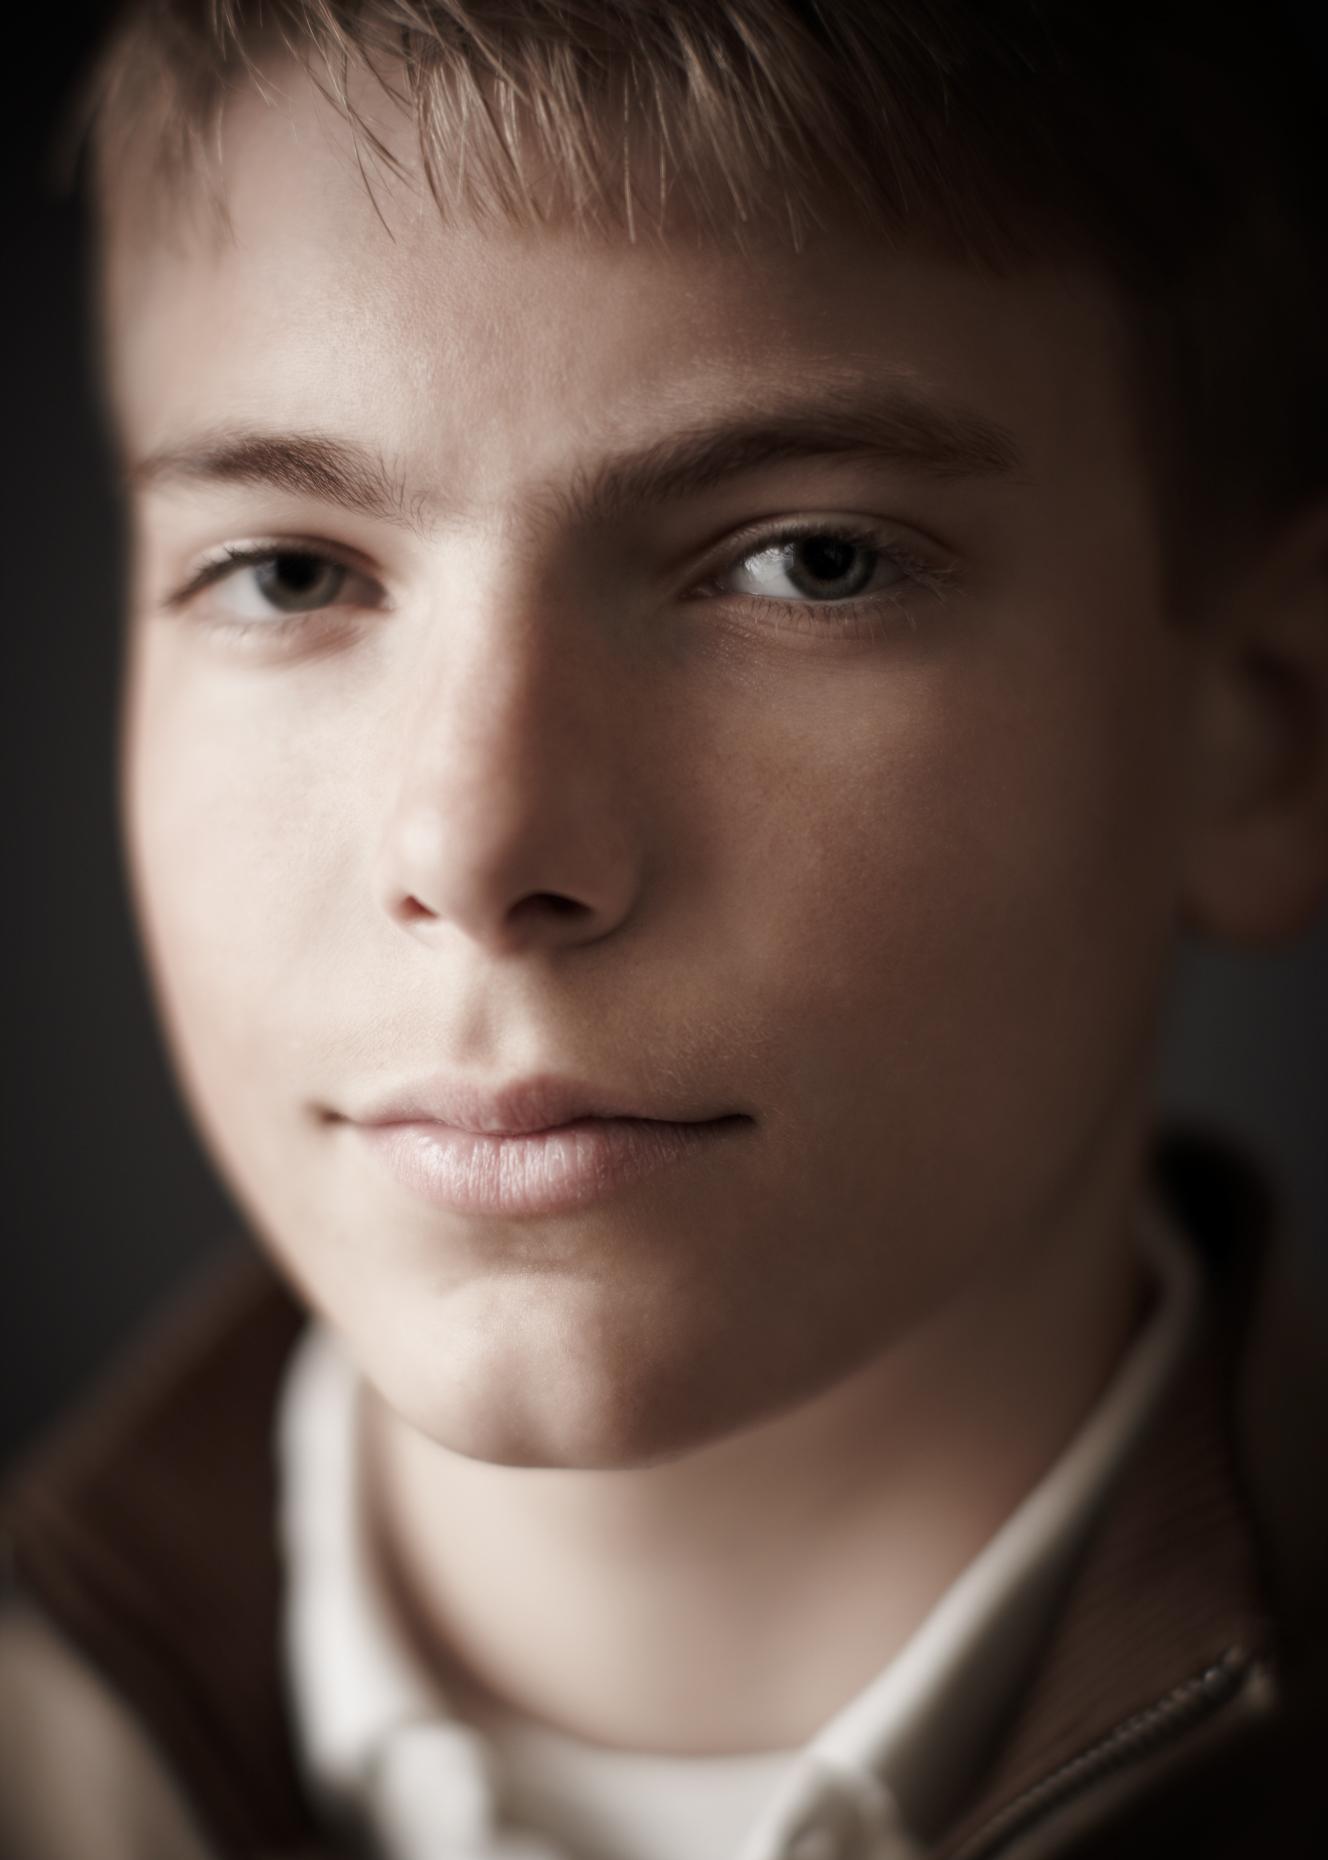 Portrait Photography Derek Israelsen Kid UpClose